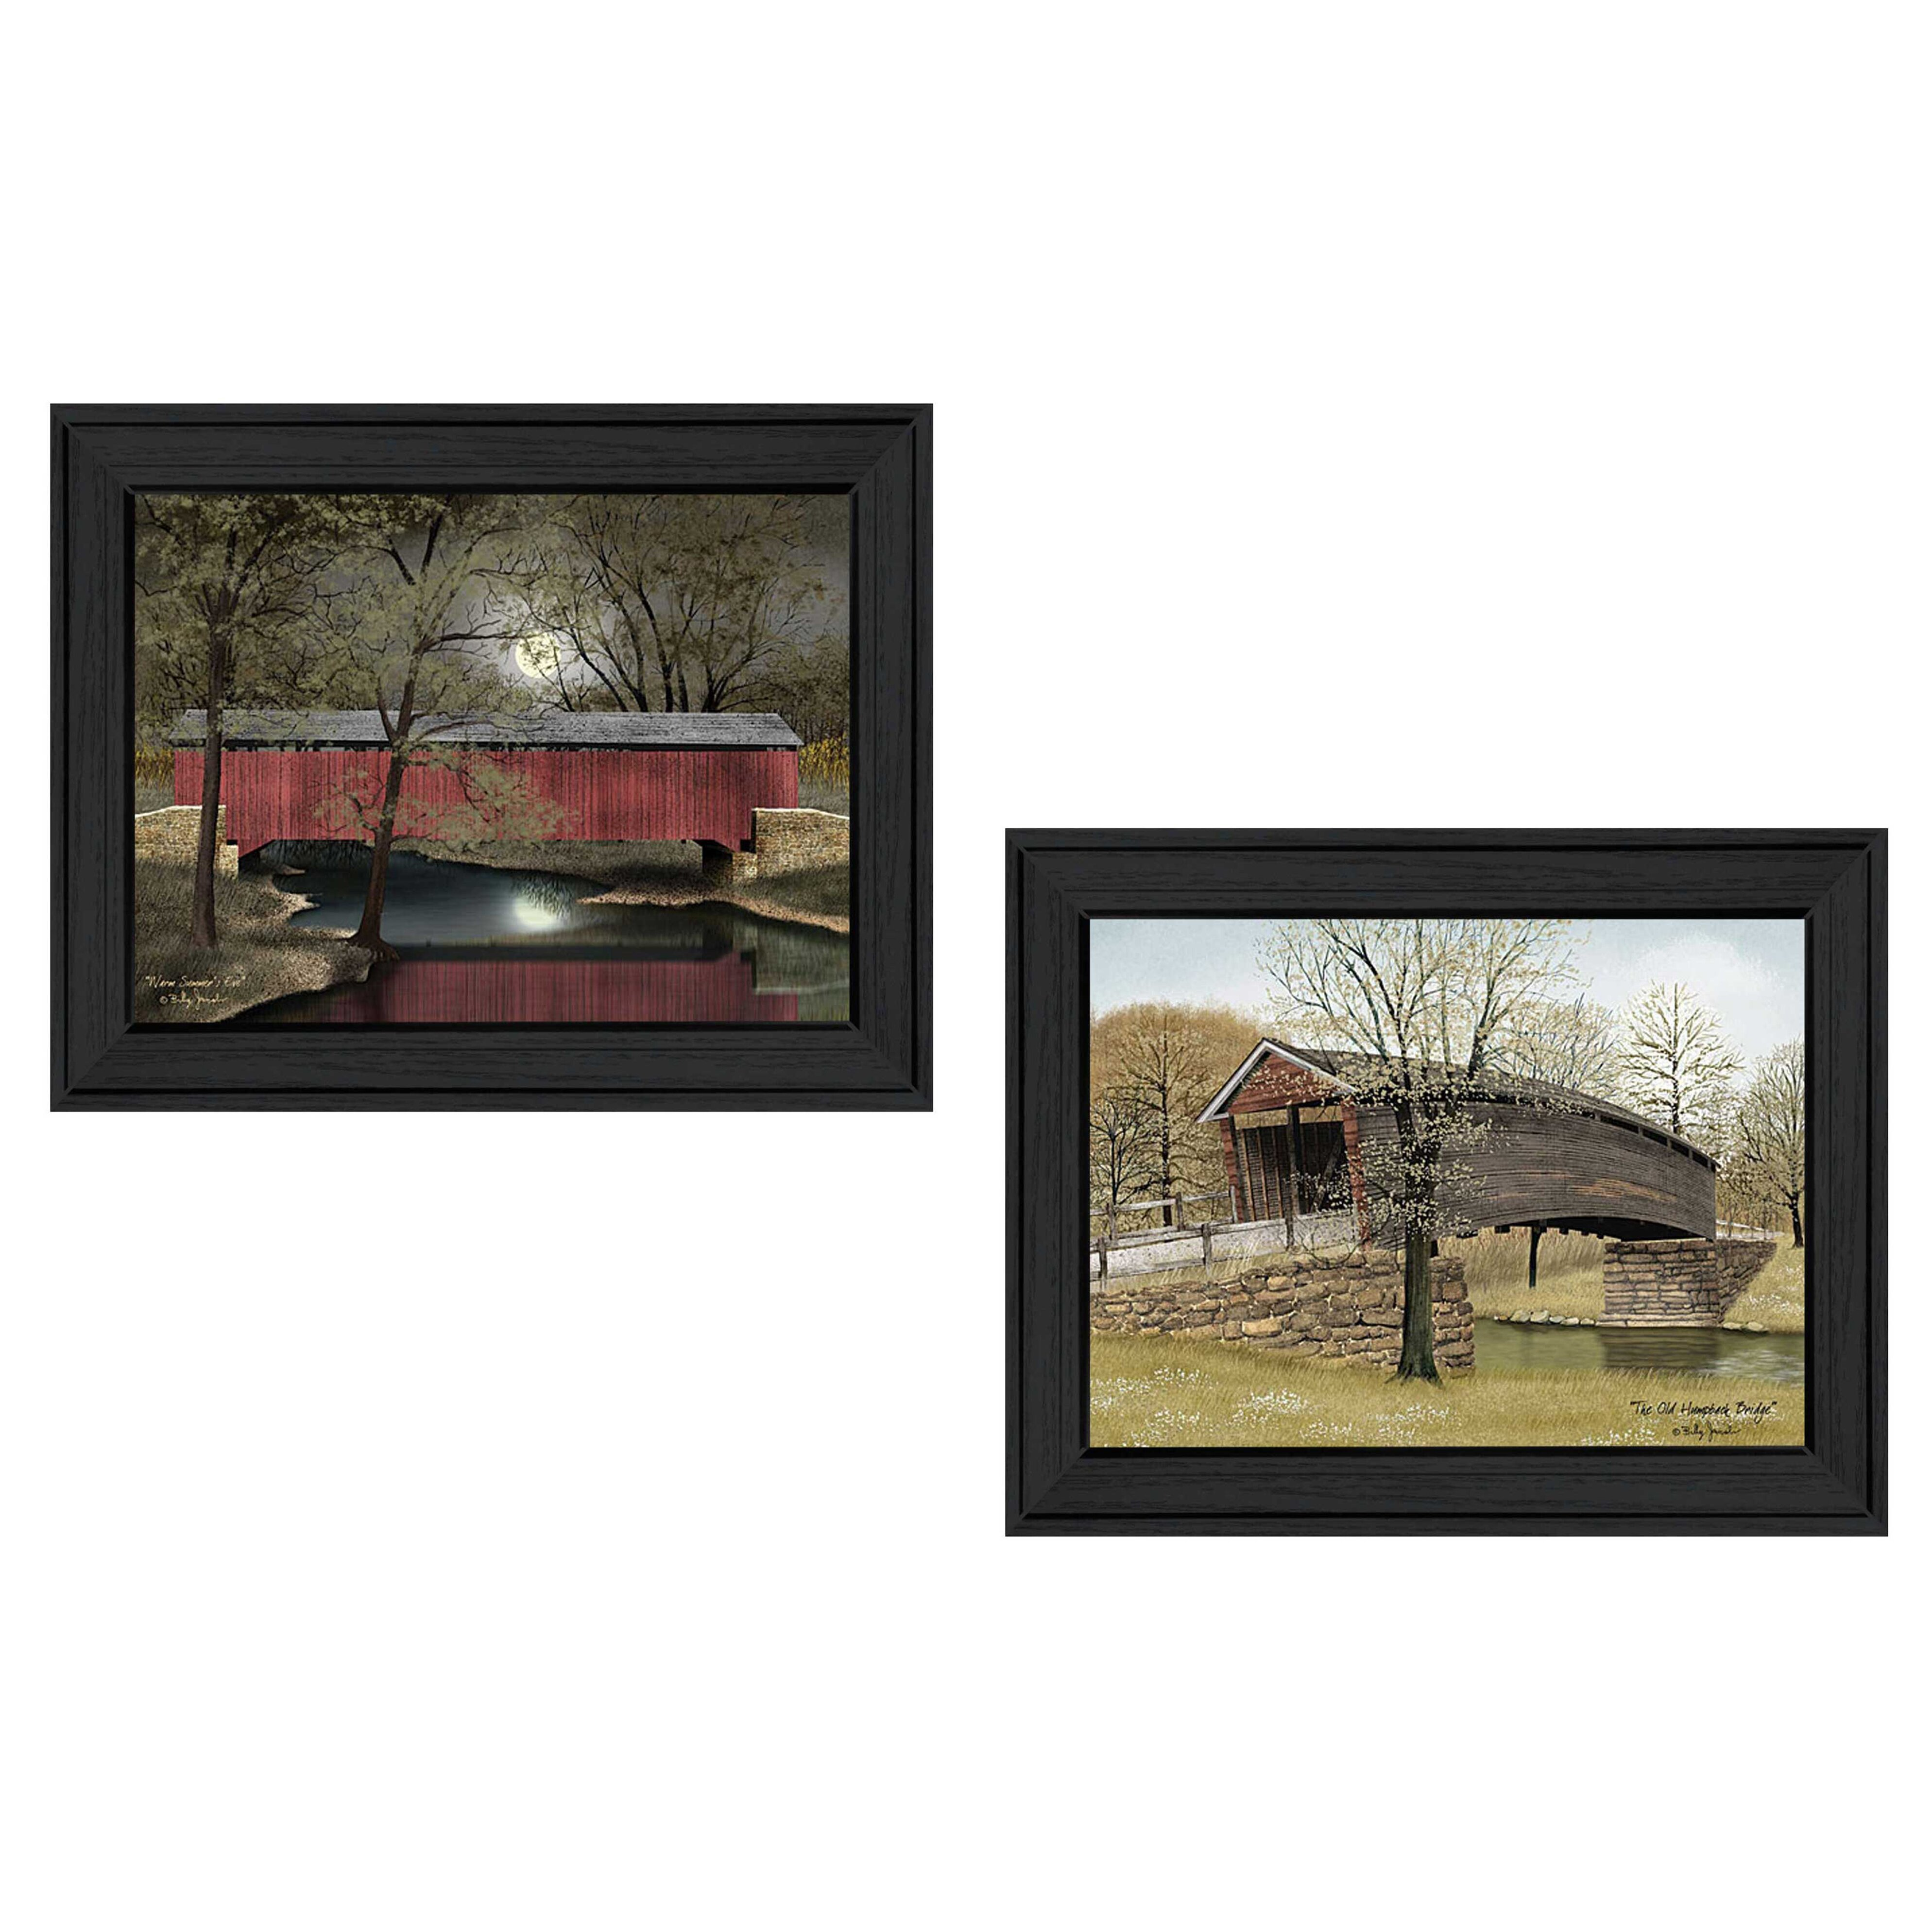 Trendy decor 4u 39 bridges 39 by billy jacobs 2 piece framed for Home decor 4 u